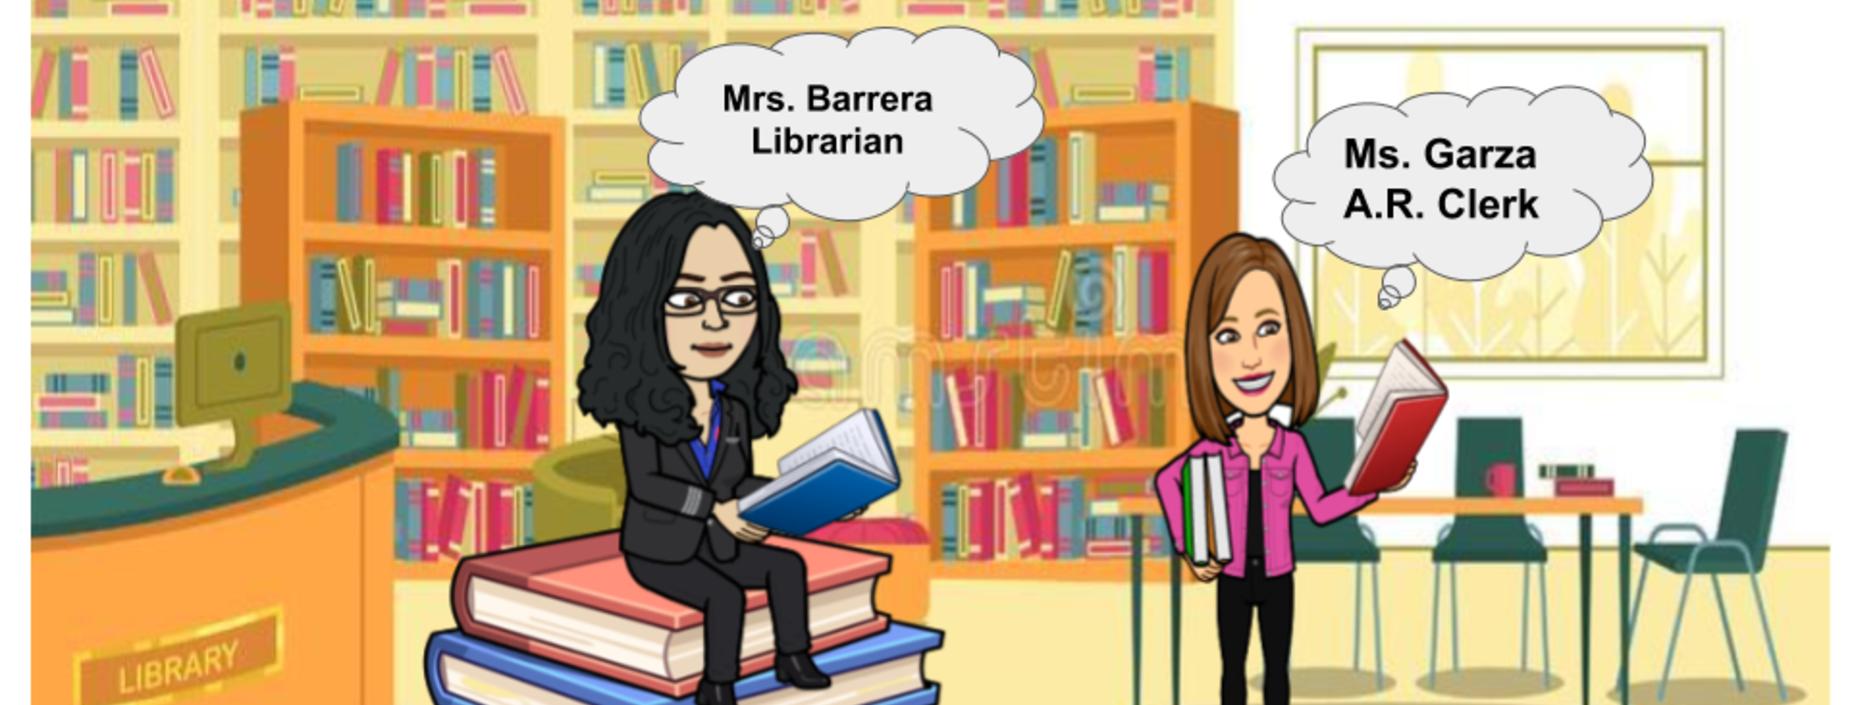 Library Bitmoji